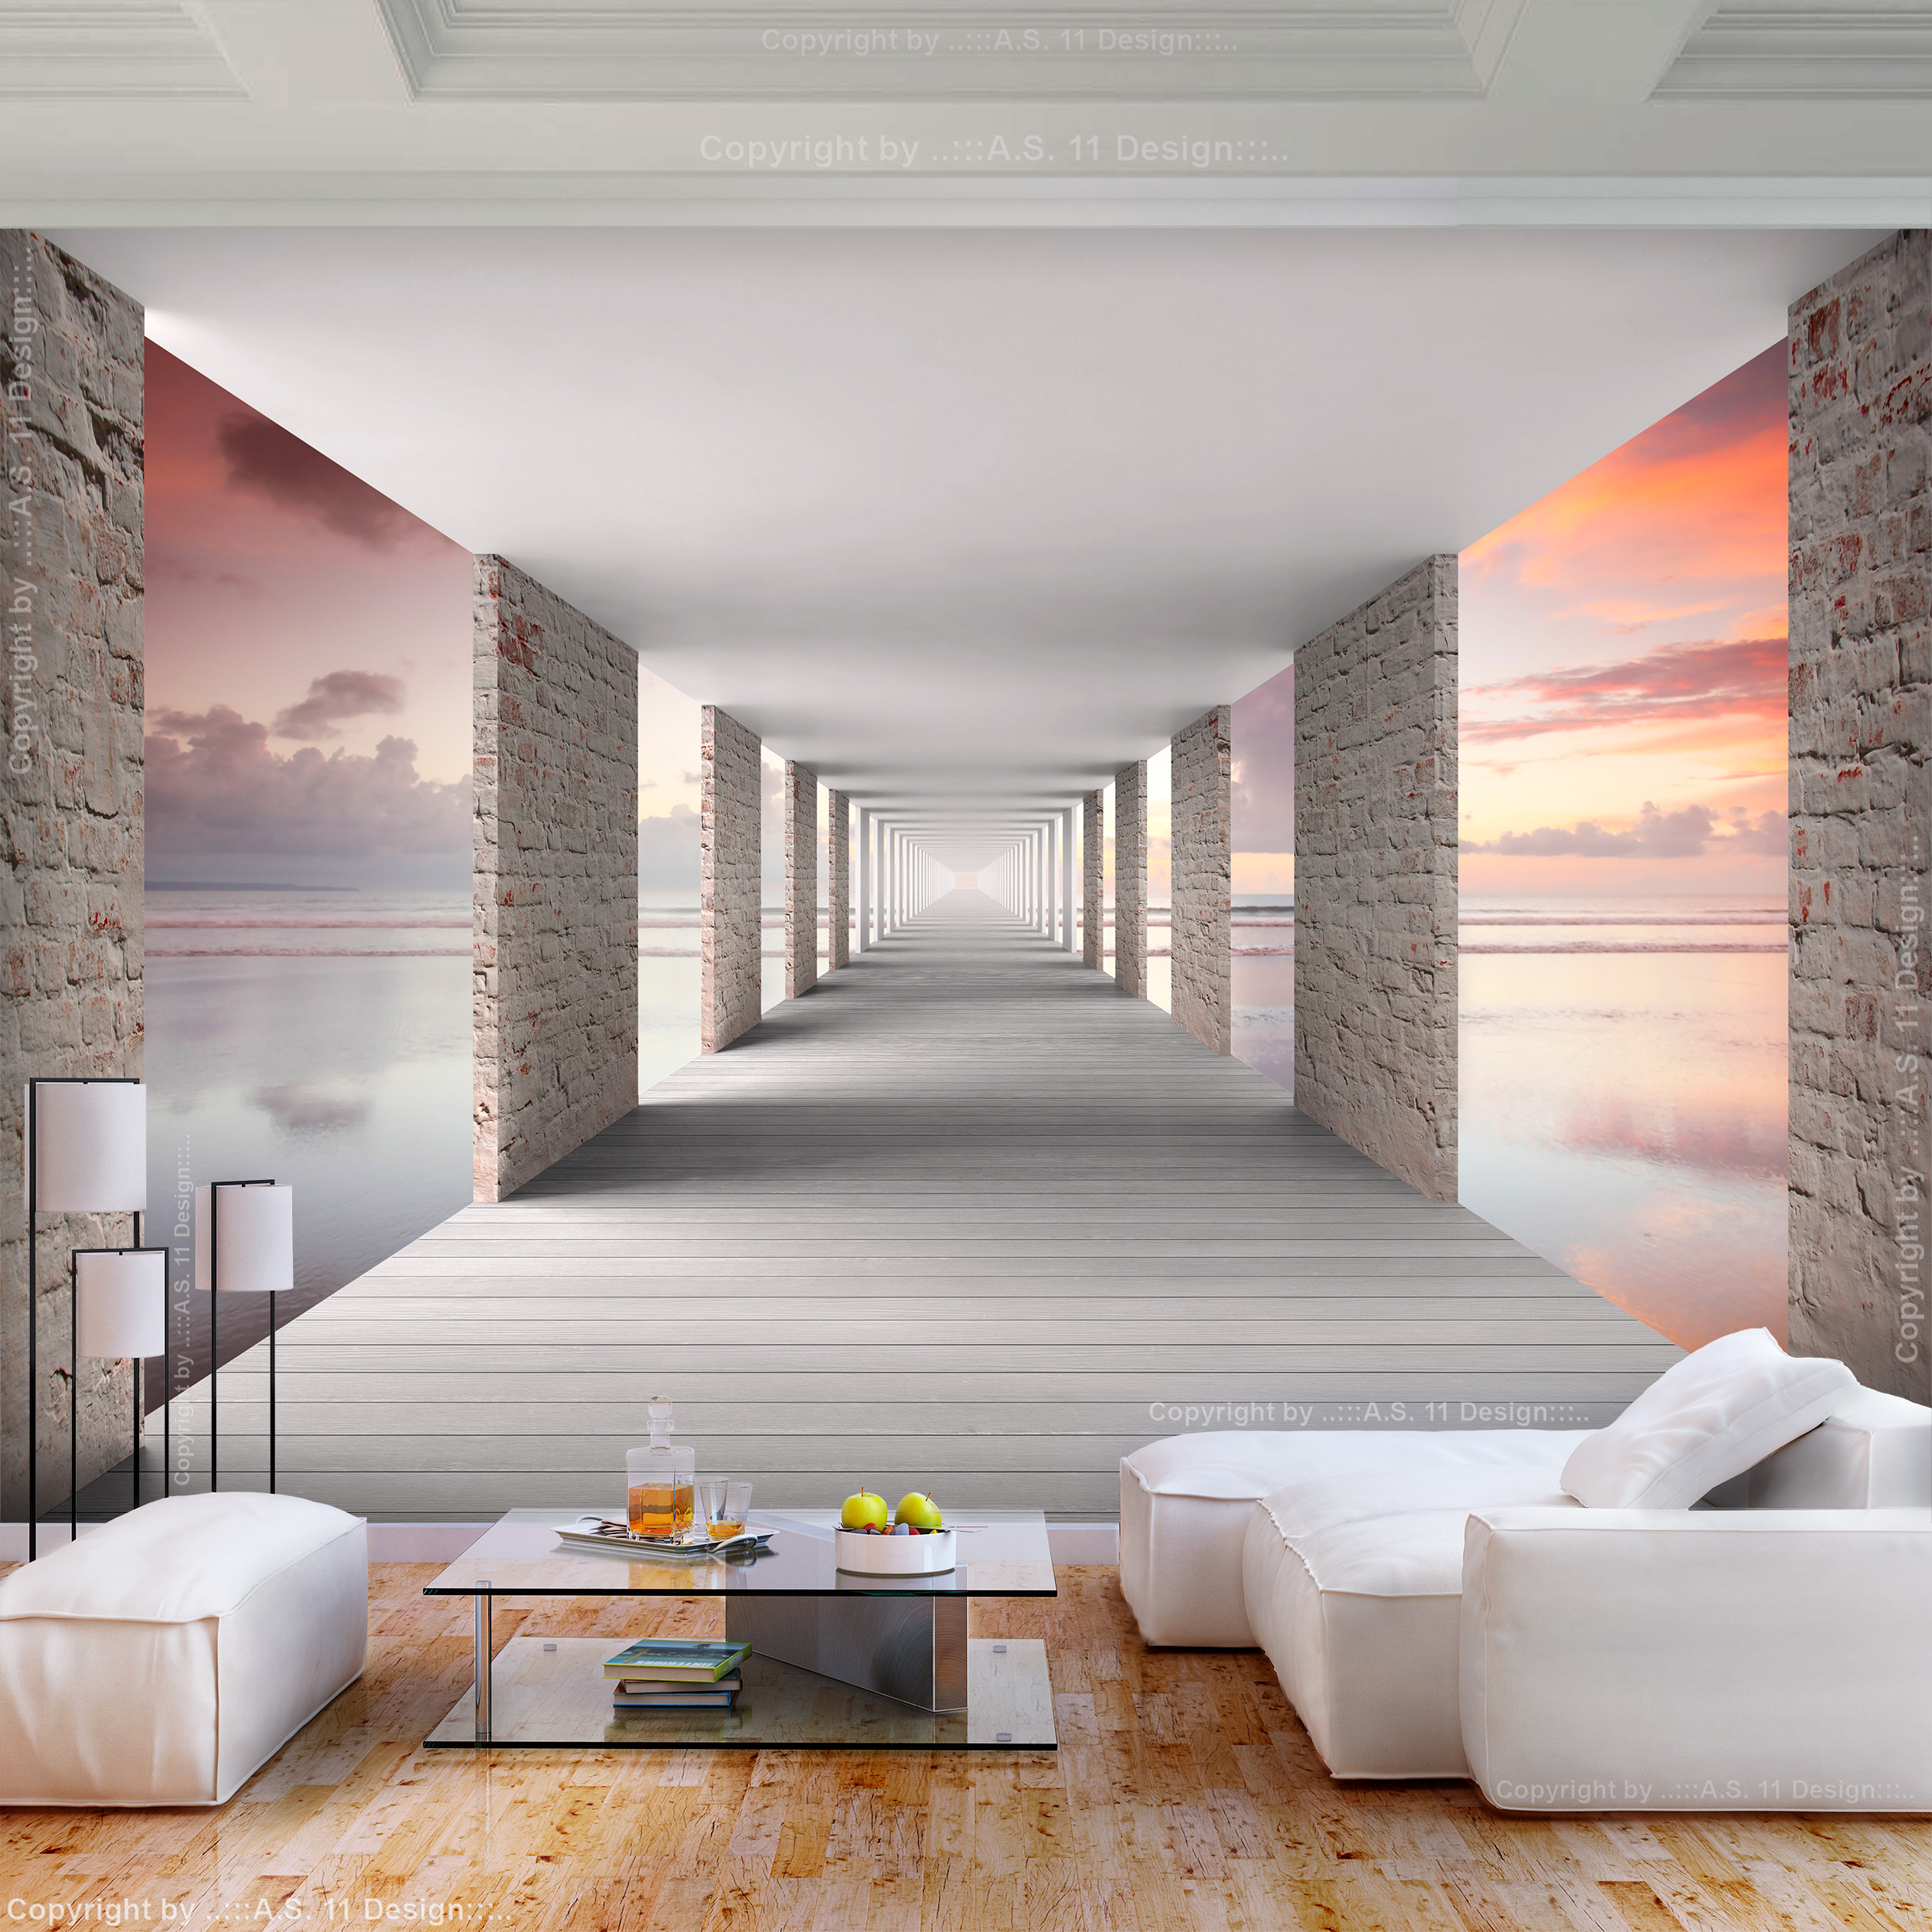 Vlies fototapete new york tunnel 3d effekt tapete schlafzimmer wandbilder xxl ebay - Leinwandbilder schlafzimmer ...